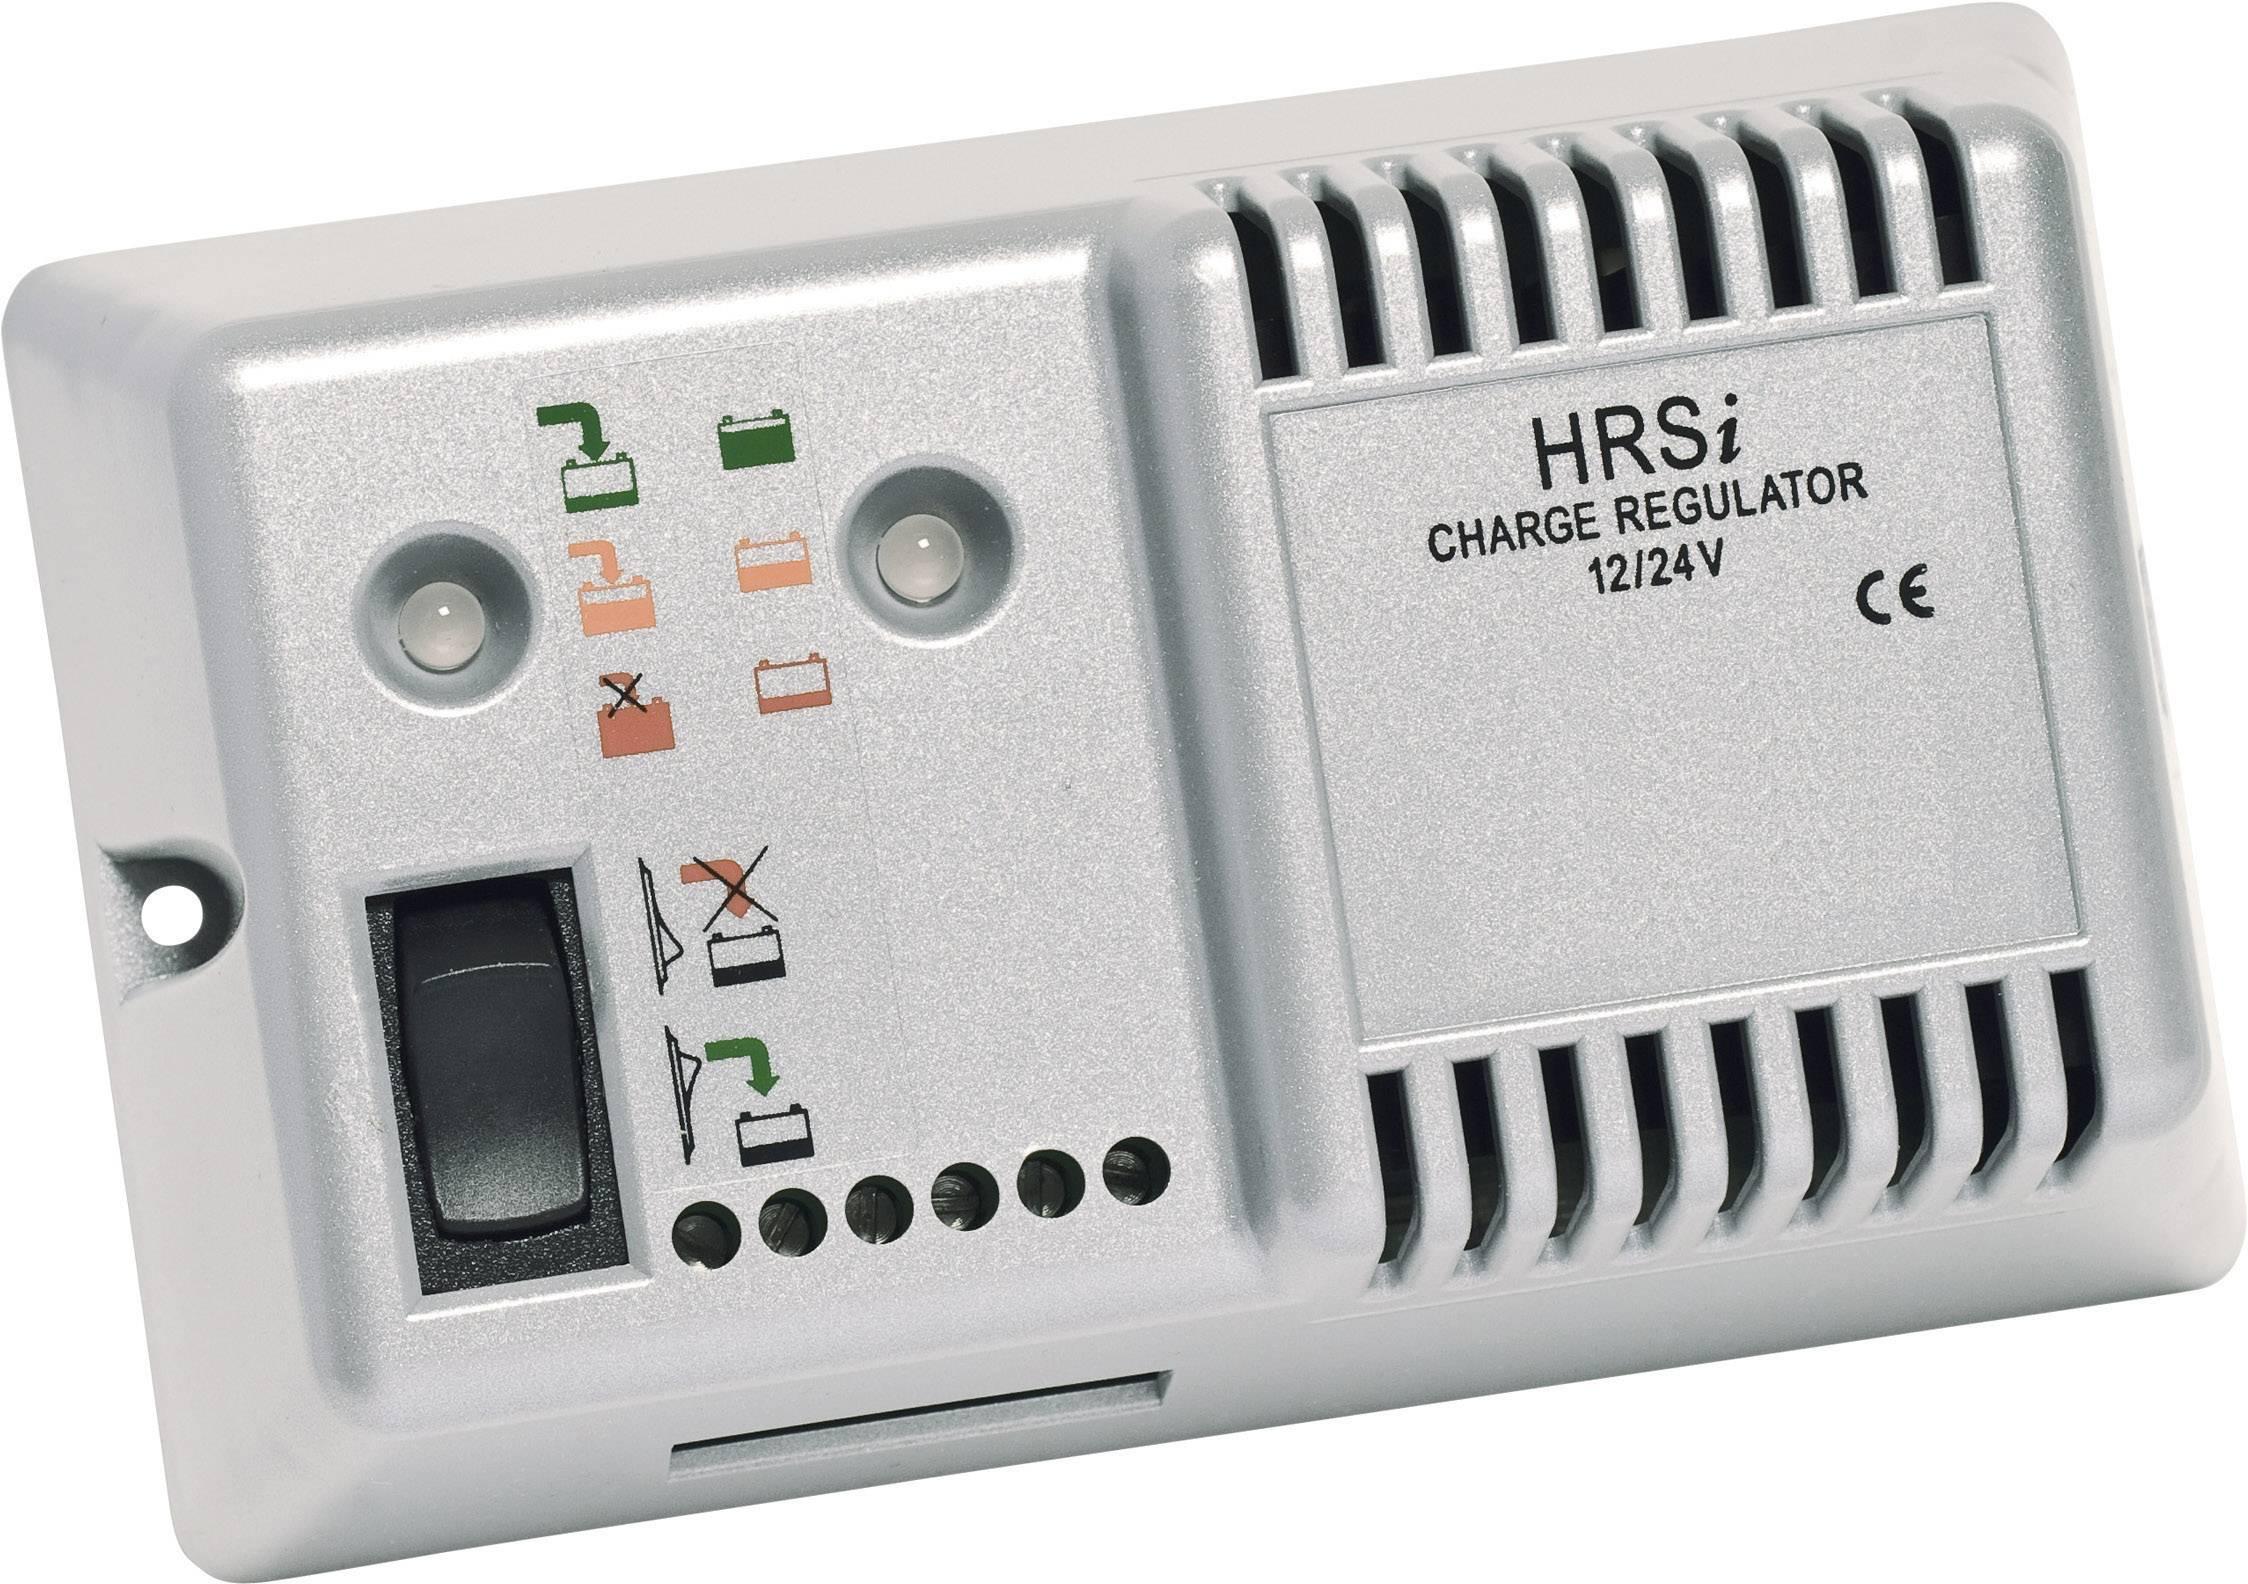 Solárny regulátor nabíjania Sunset HRSi Charge Regulator Marlec, 10 A, 12 V, 24 V